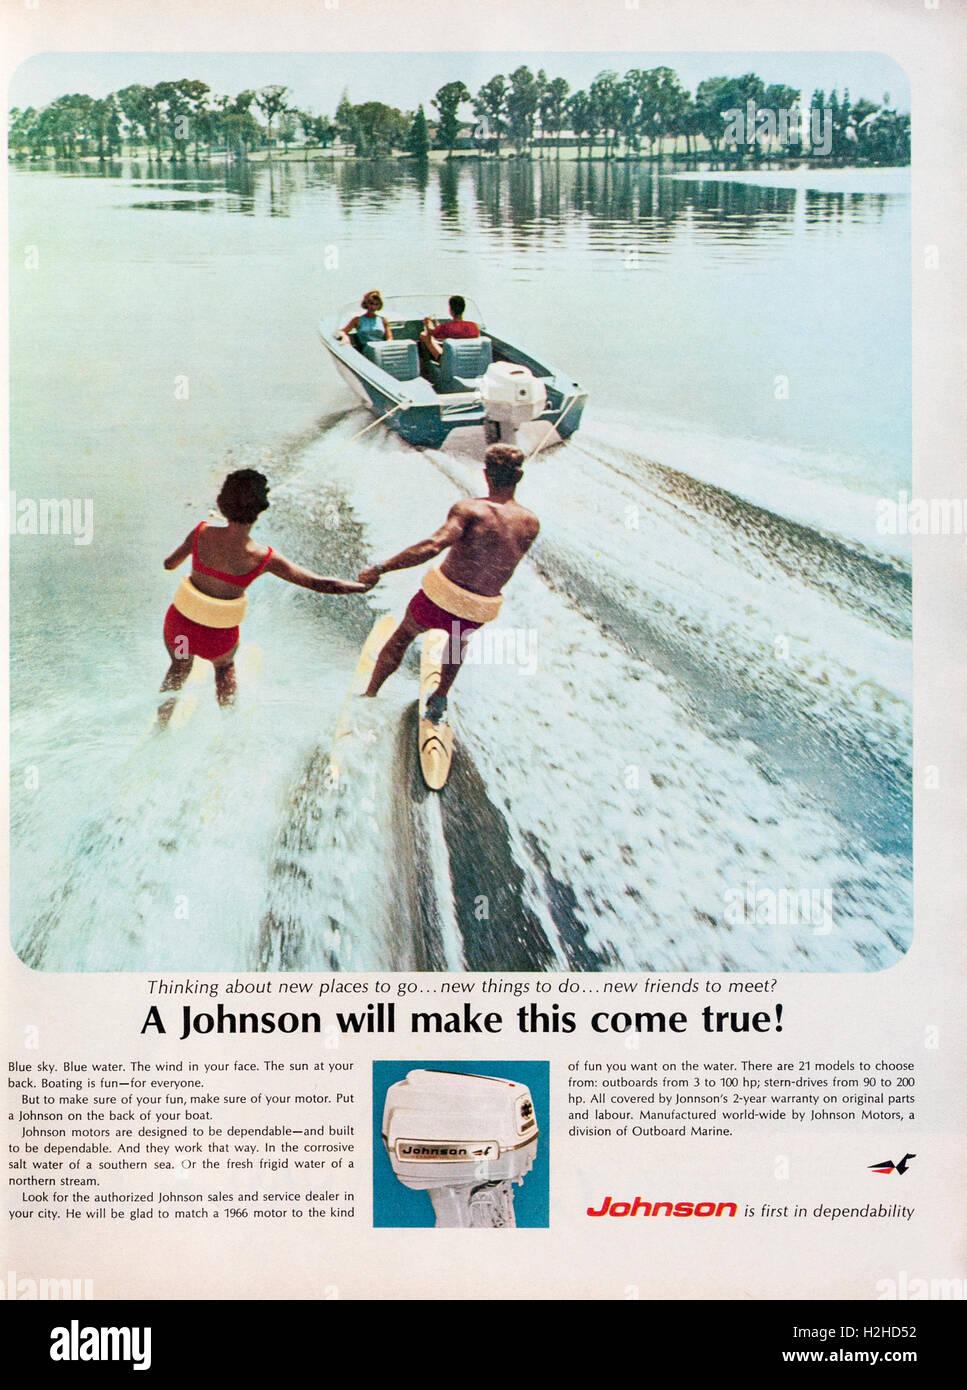 1960s magazine advertisement advertising Johnson outboard motors. - Stock Image